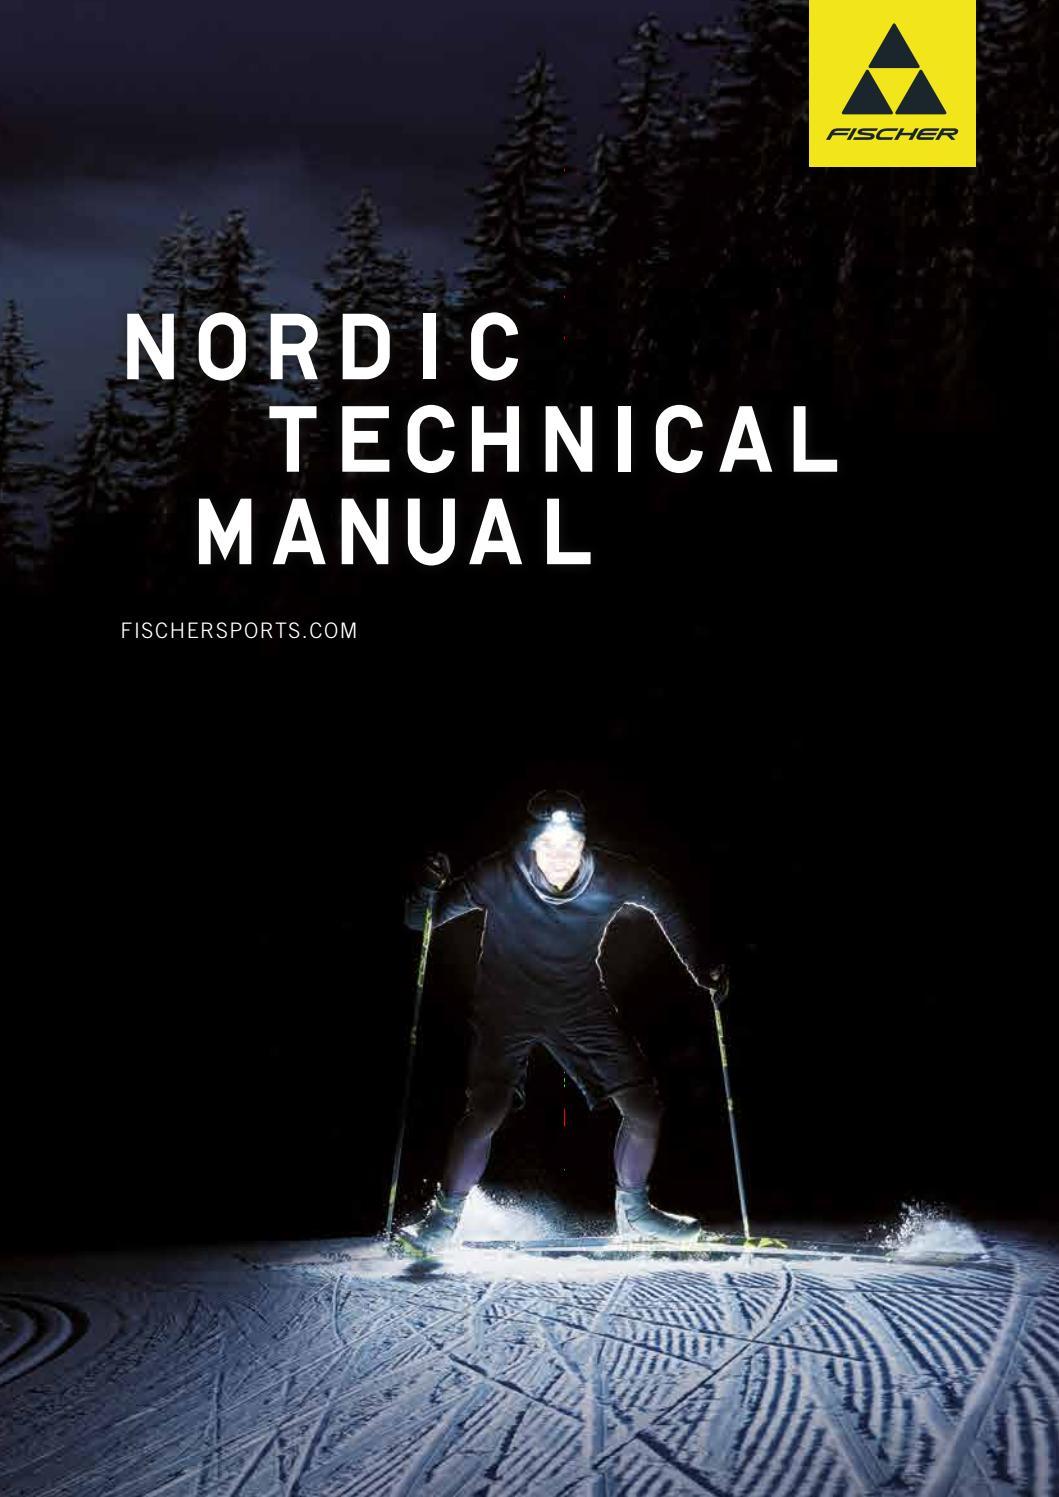 NORDIC TECHNICAL MANUAL